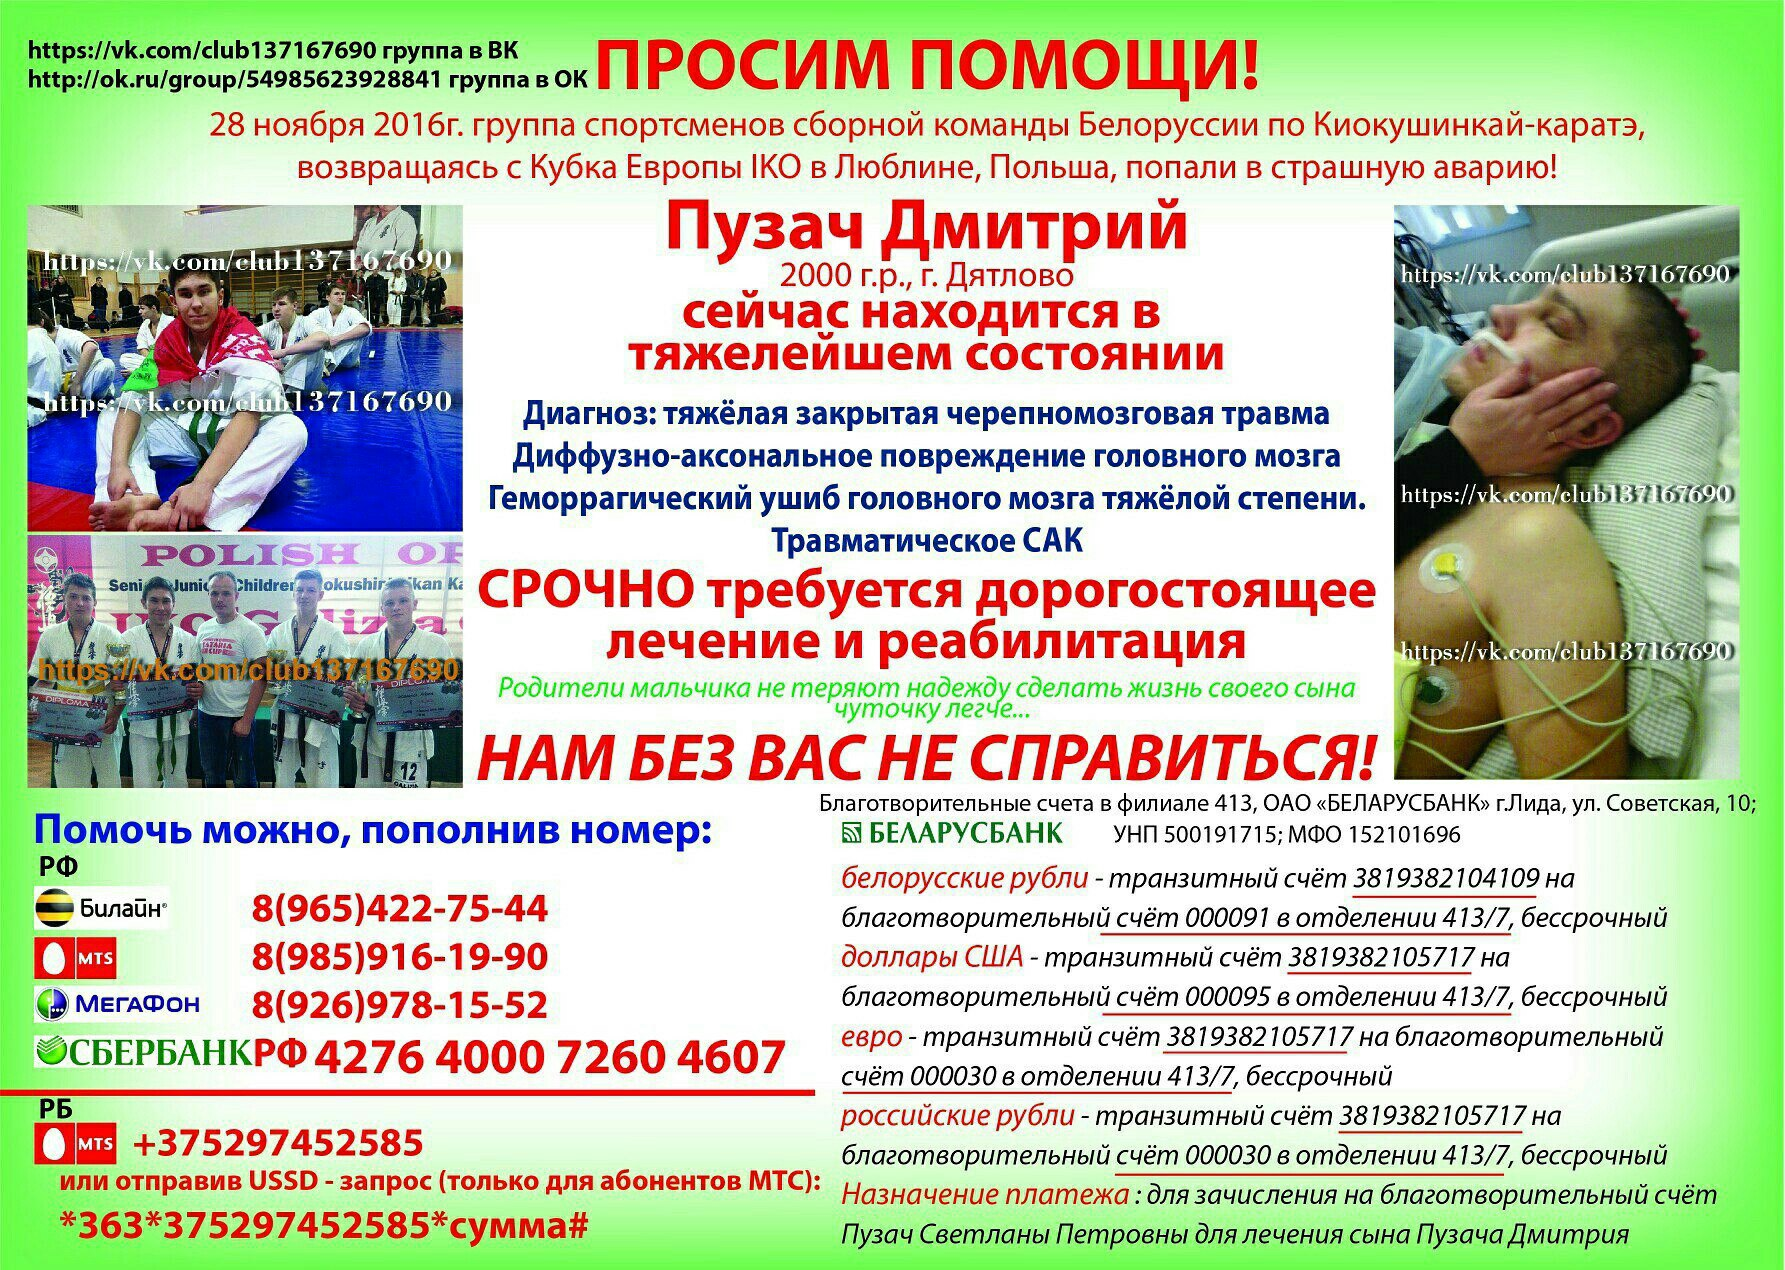 Поможем Пузачу Дмитрию!